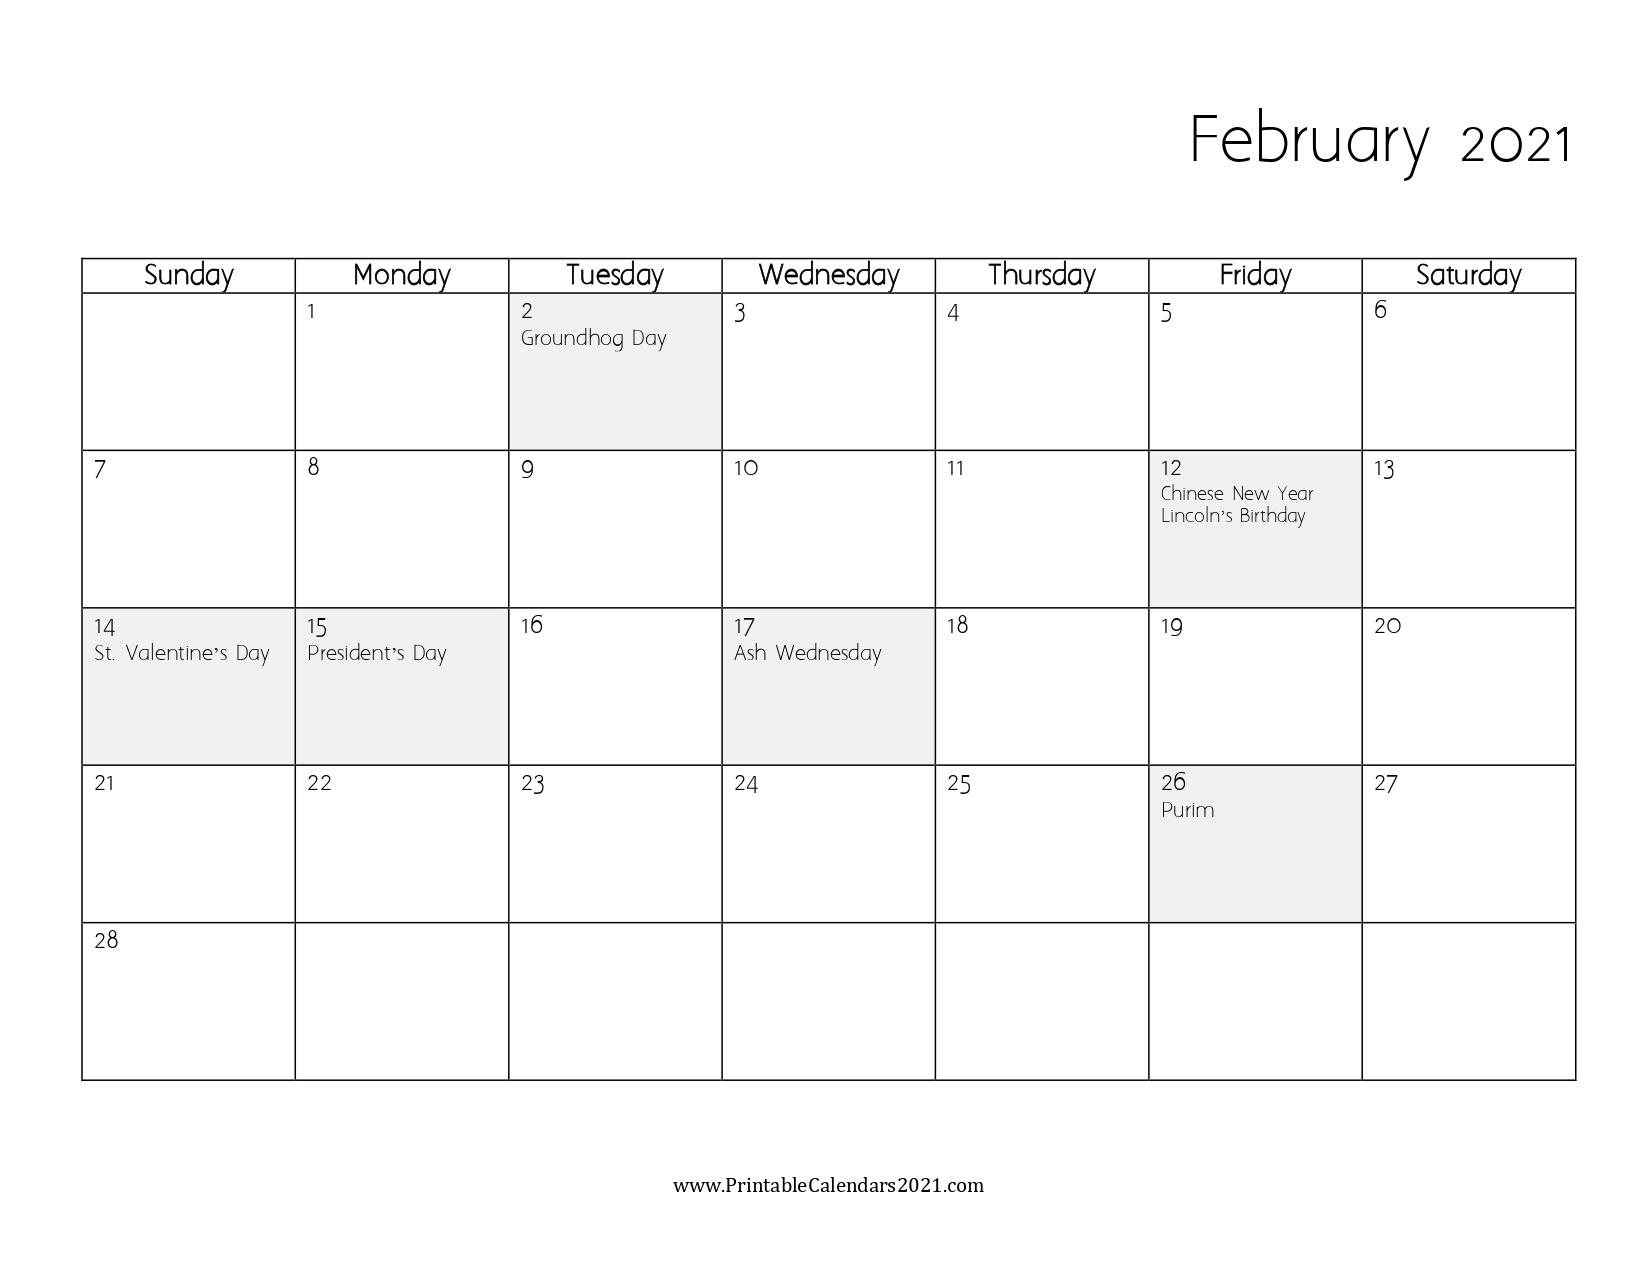 65 Free February 2021 Calendar Printable With Holidays 5